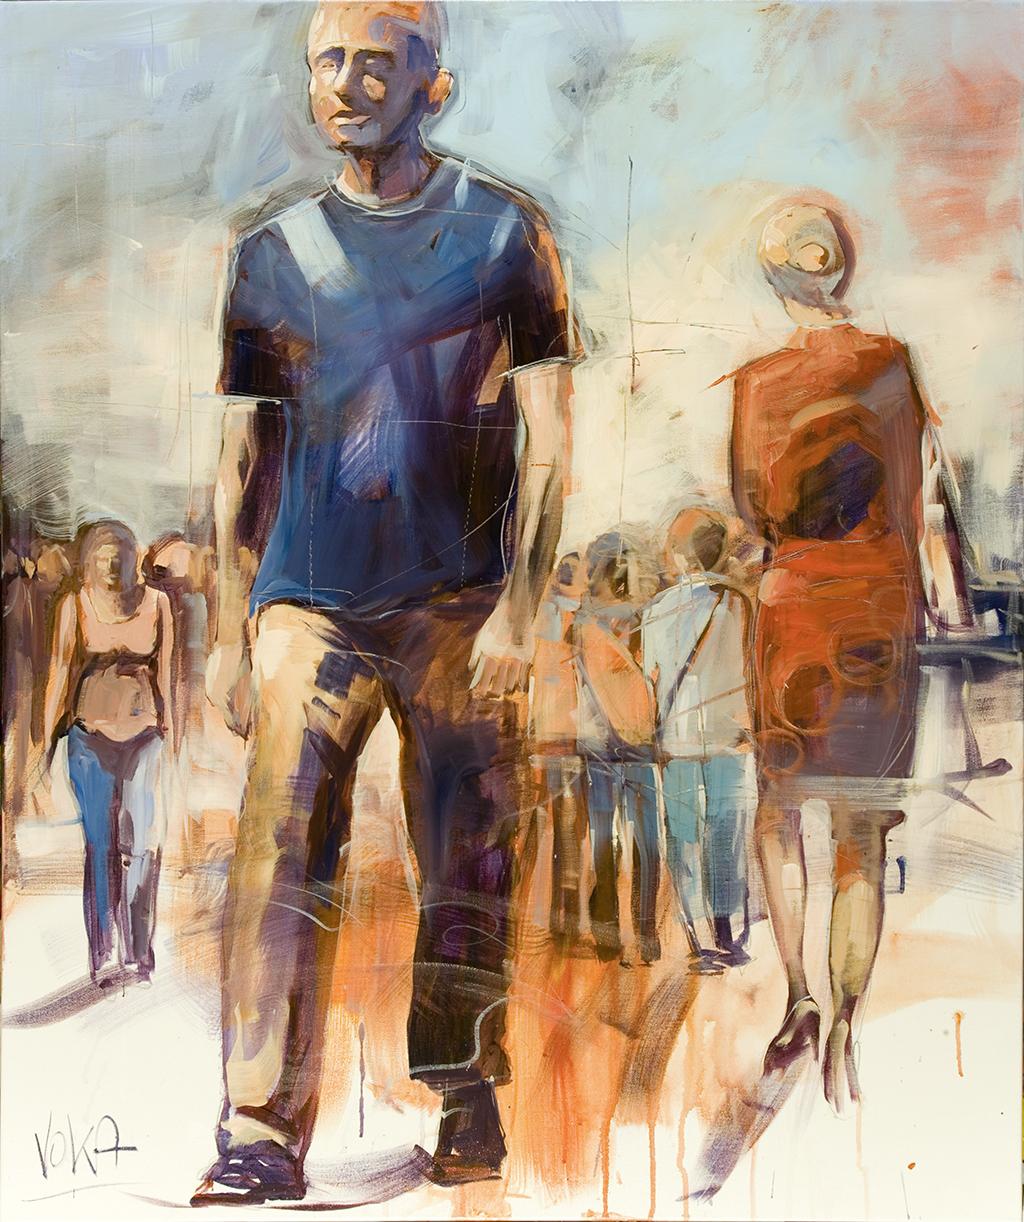 People, 120X100cm / 47,2X39,4 inch, Acrylic on Canvas